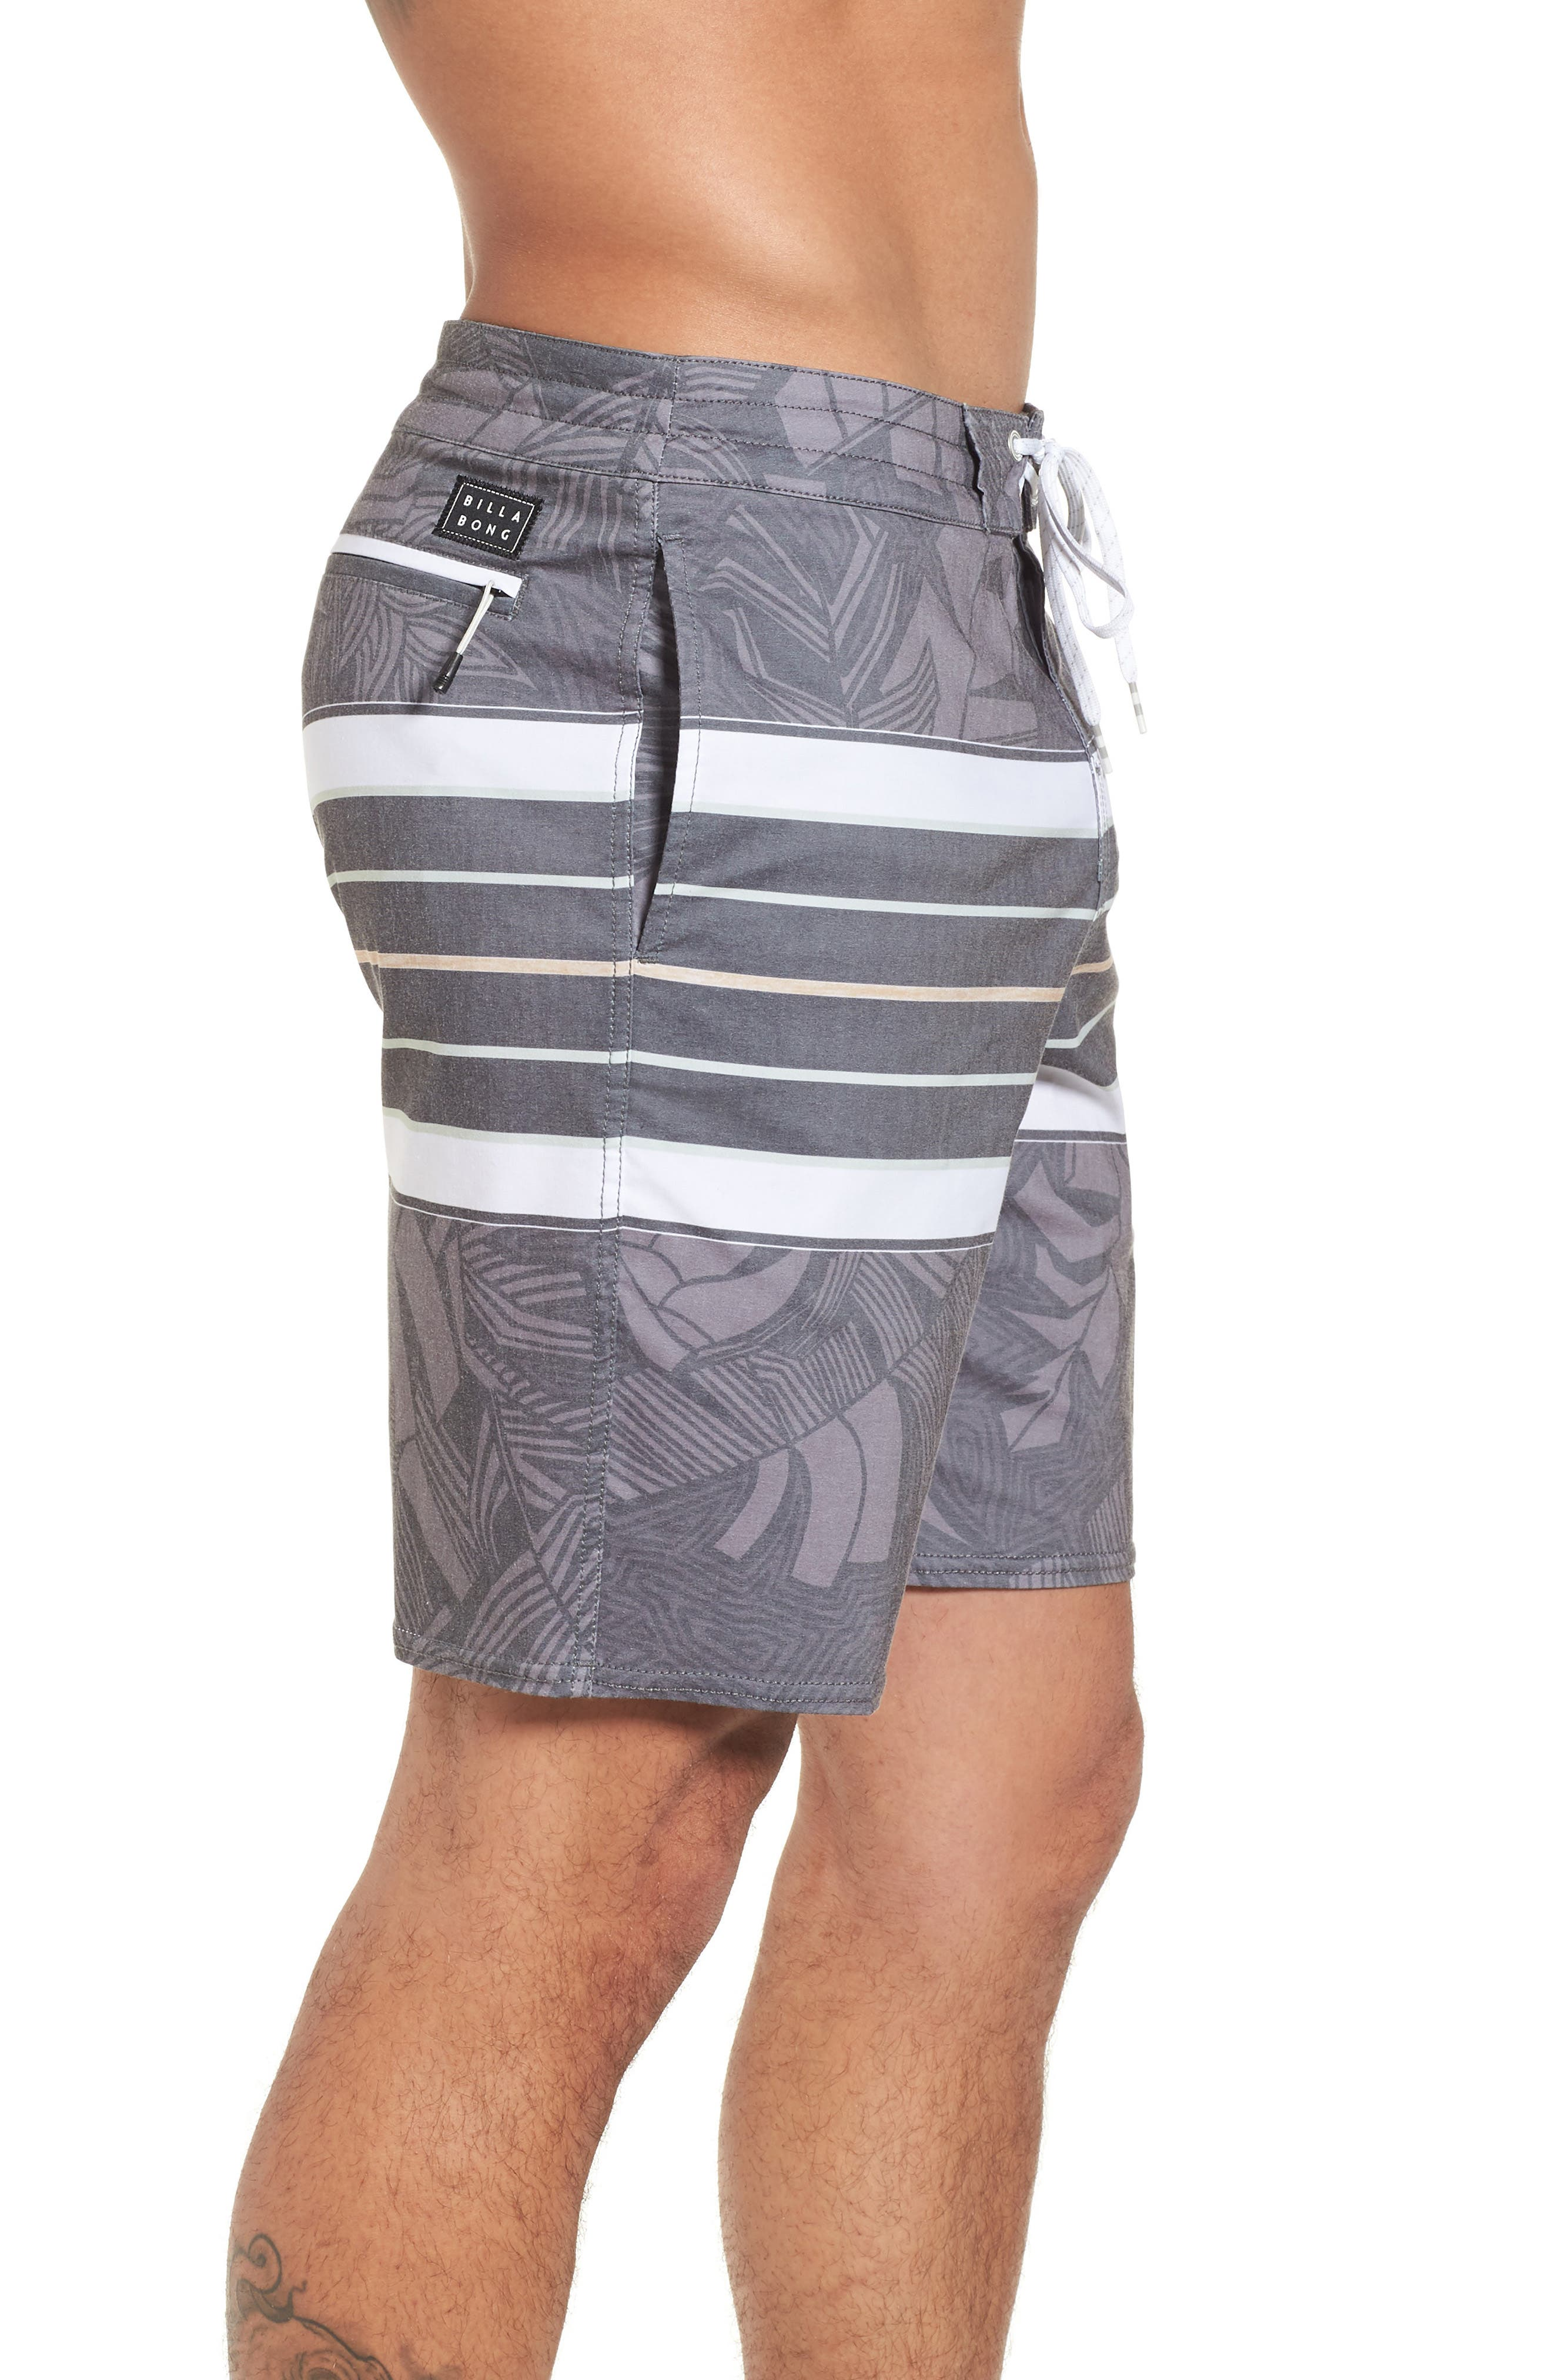 Stringer Lo Tides Board Shorts,                             Alternate thumbnail 3, color,                             001